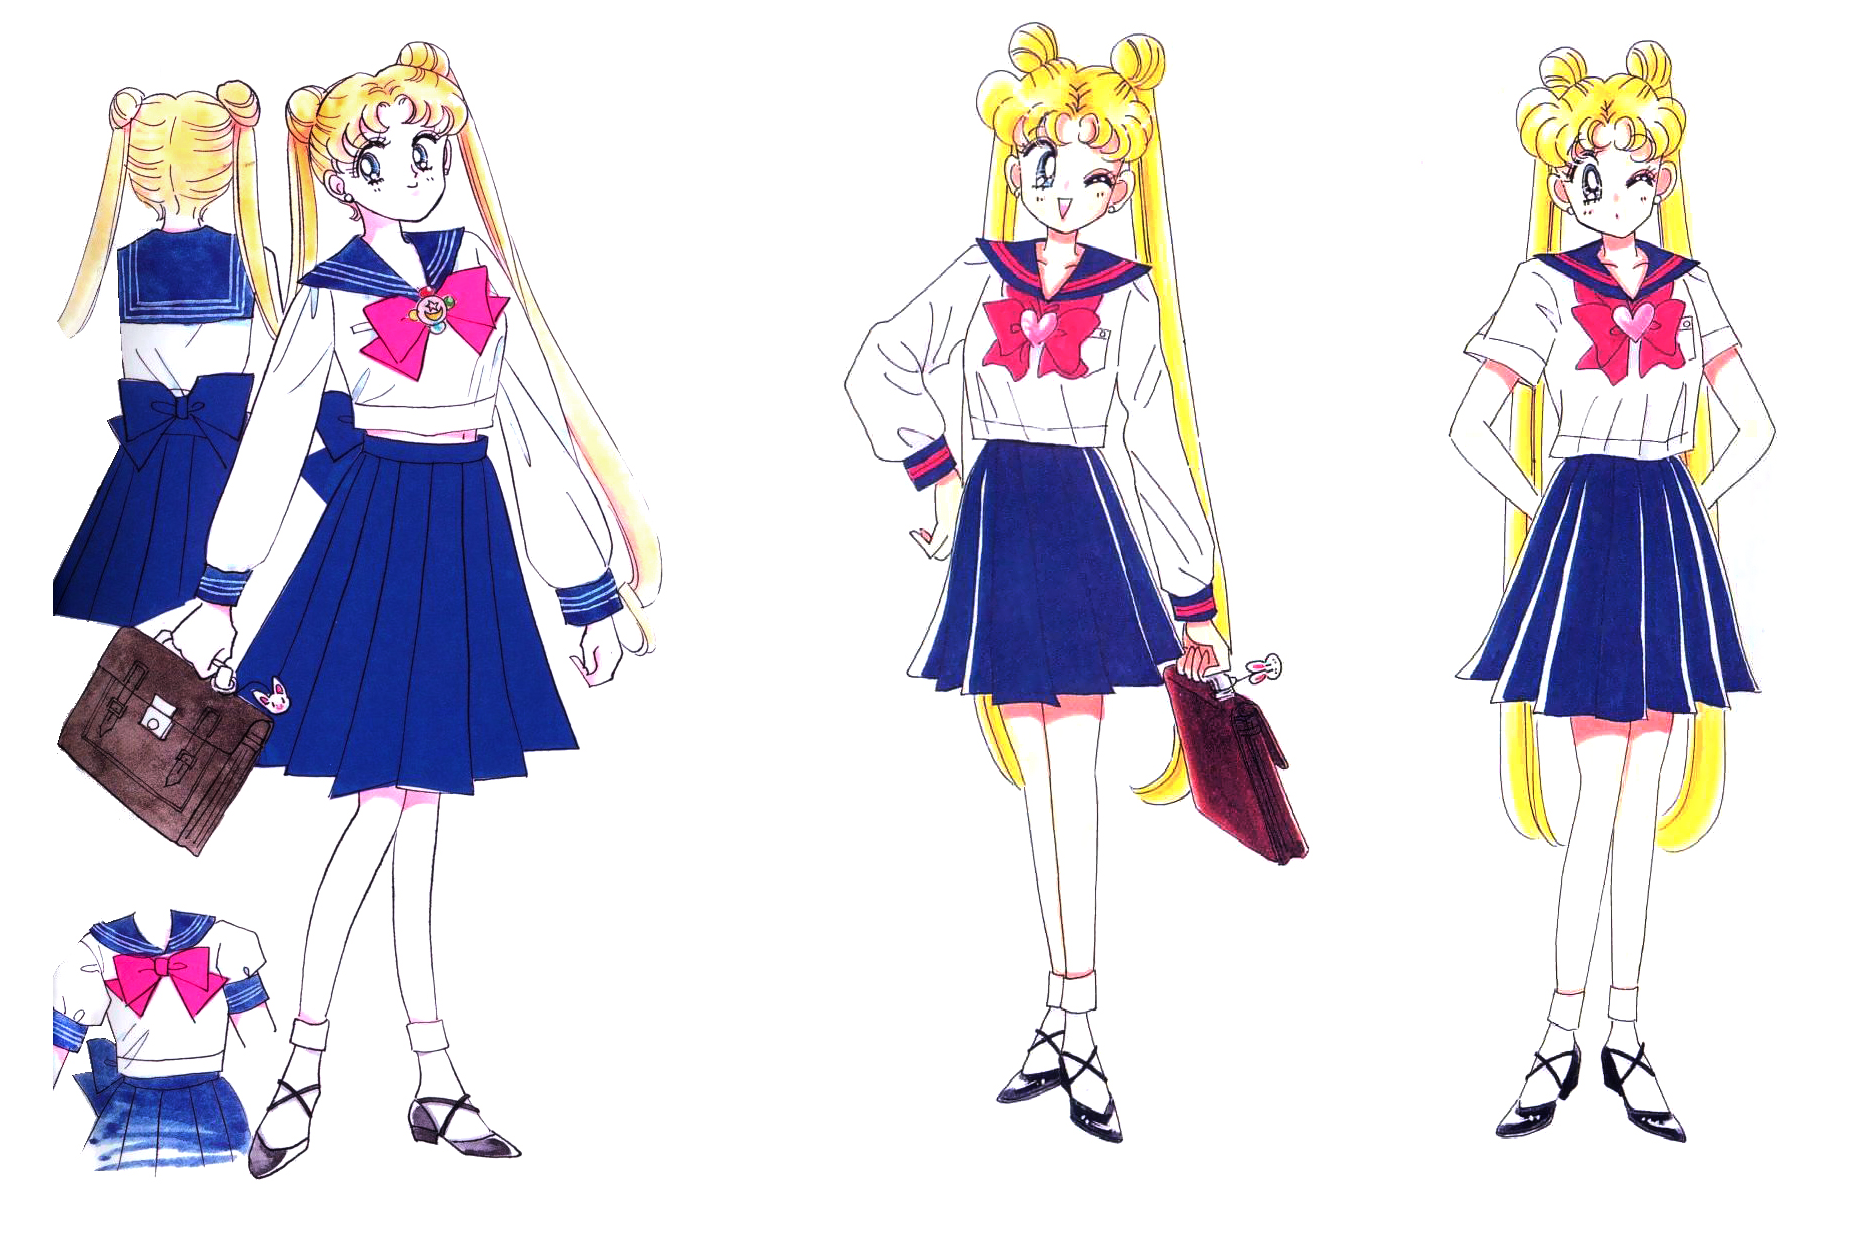 School Uniforms, Usagi Tsukino - 1545.7KB